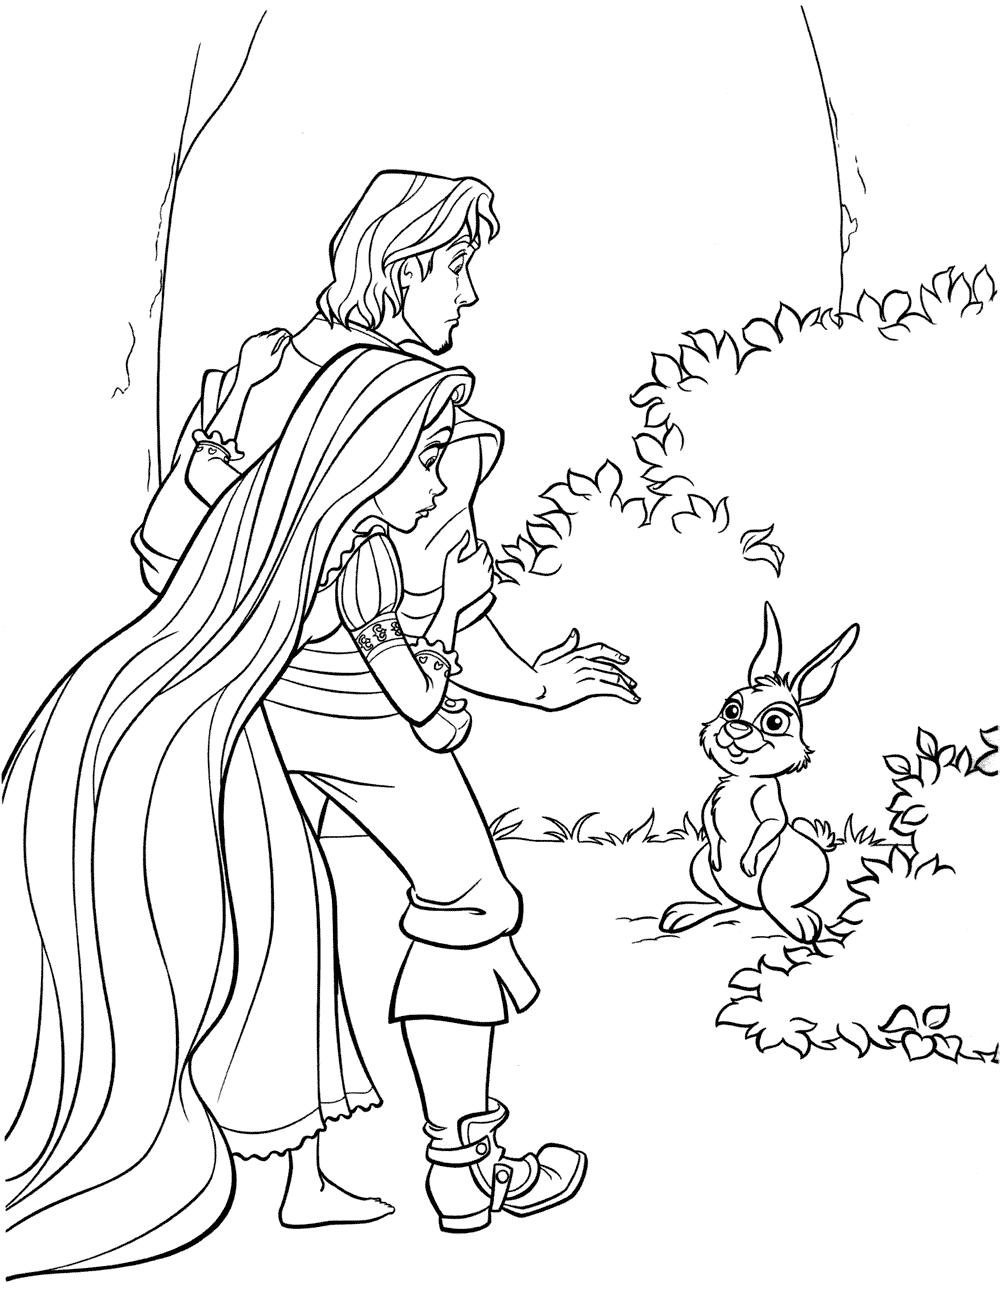 Ausmalbilder Für Kinder Rapunzel : Ausmalbilder F R Kinder Flynn